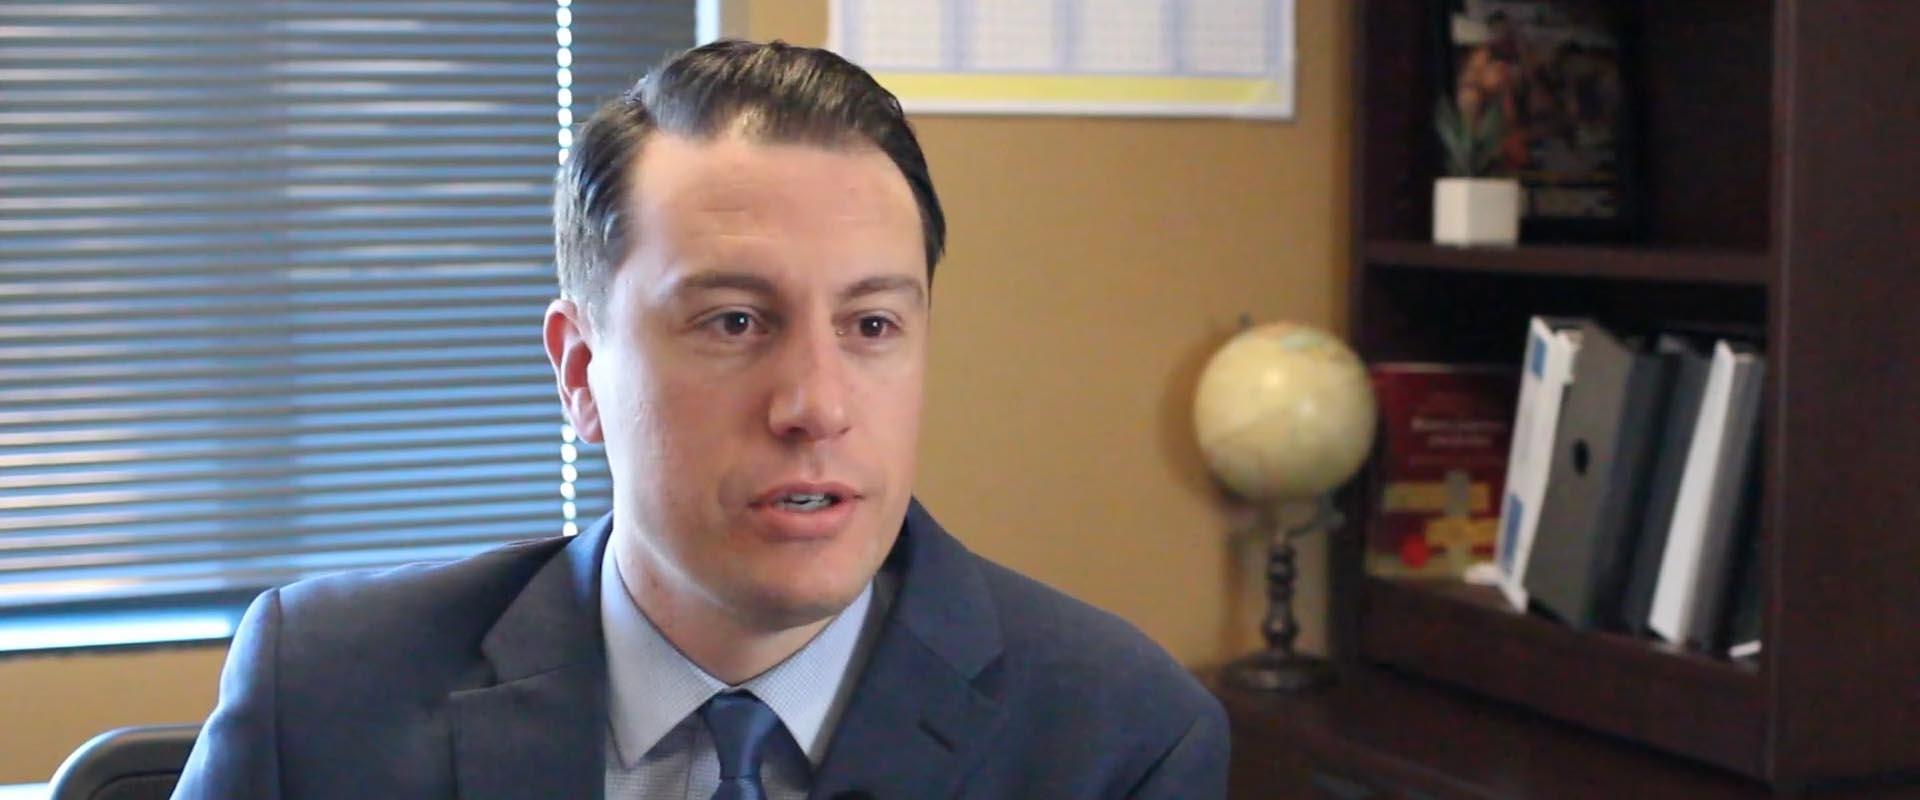 Attorney Videos